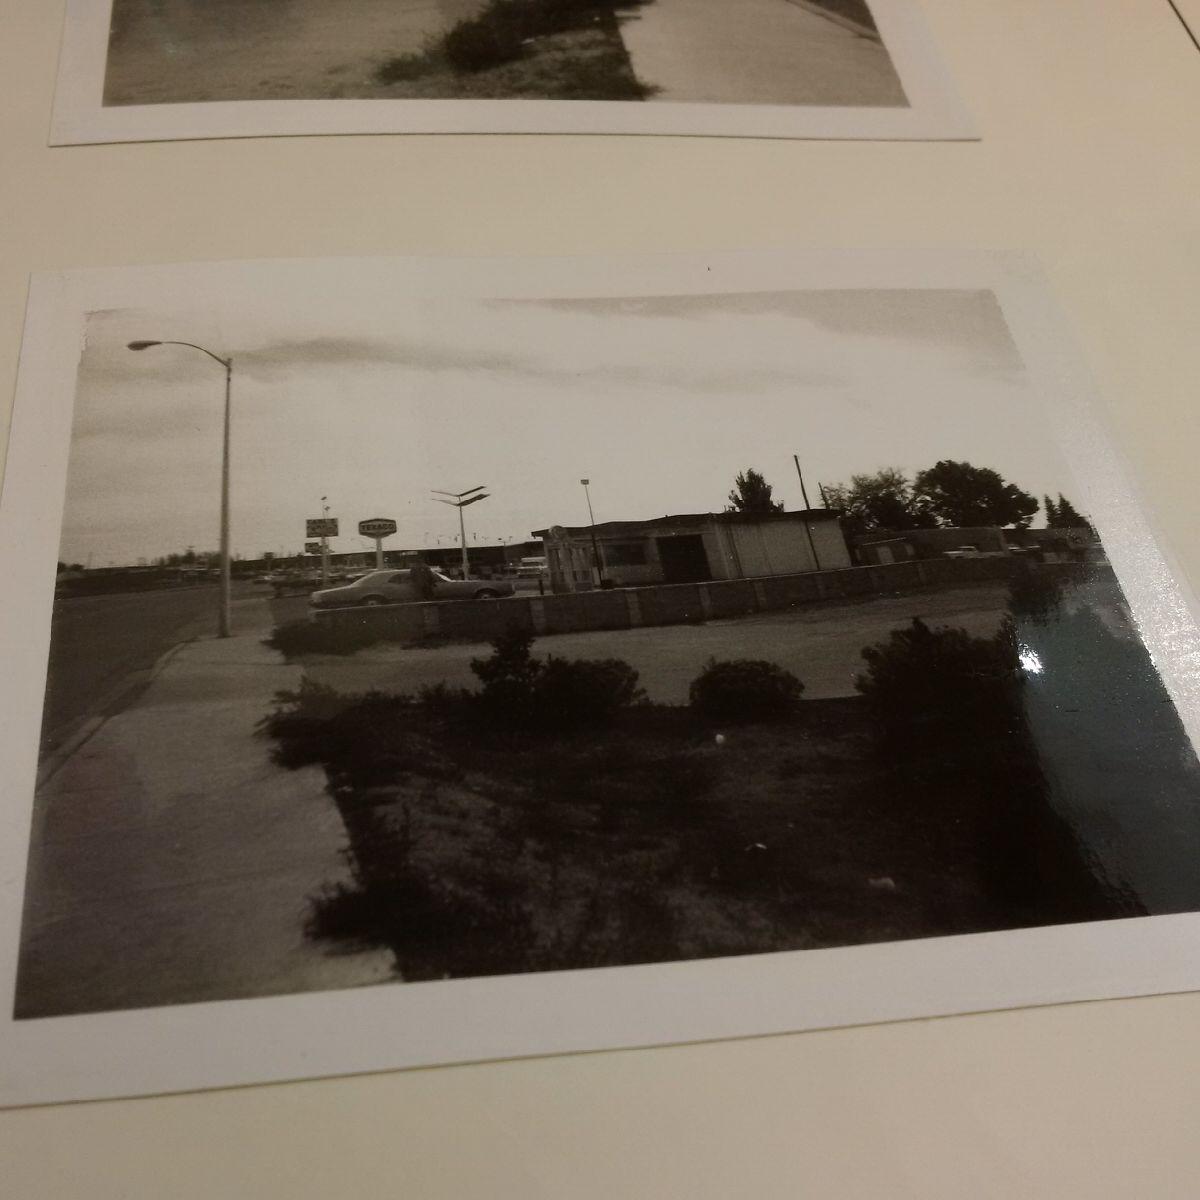 Smith Vet Hospital parking lot, 1978